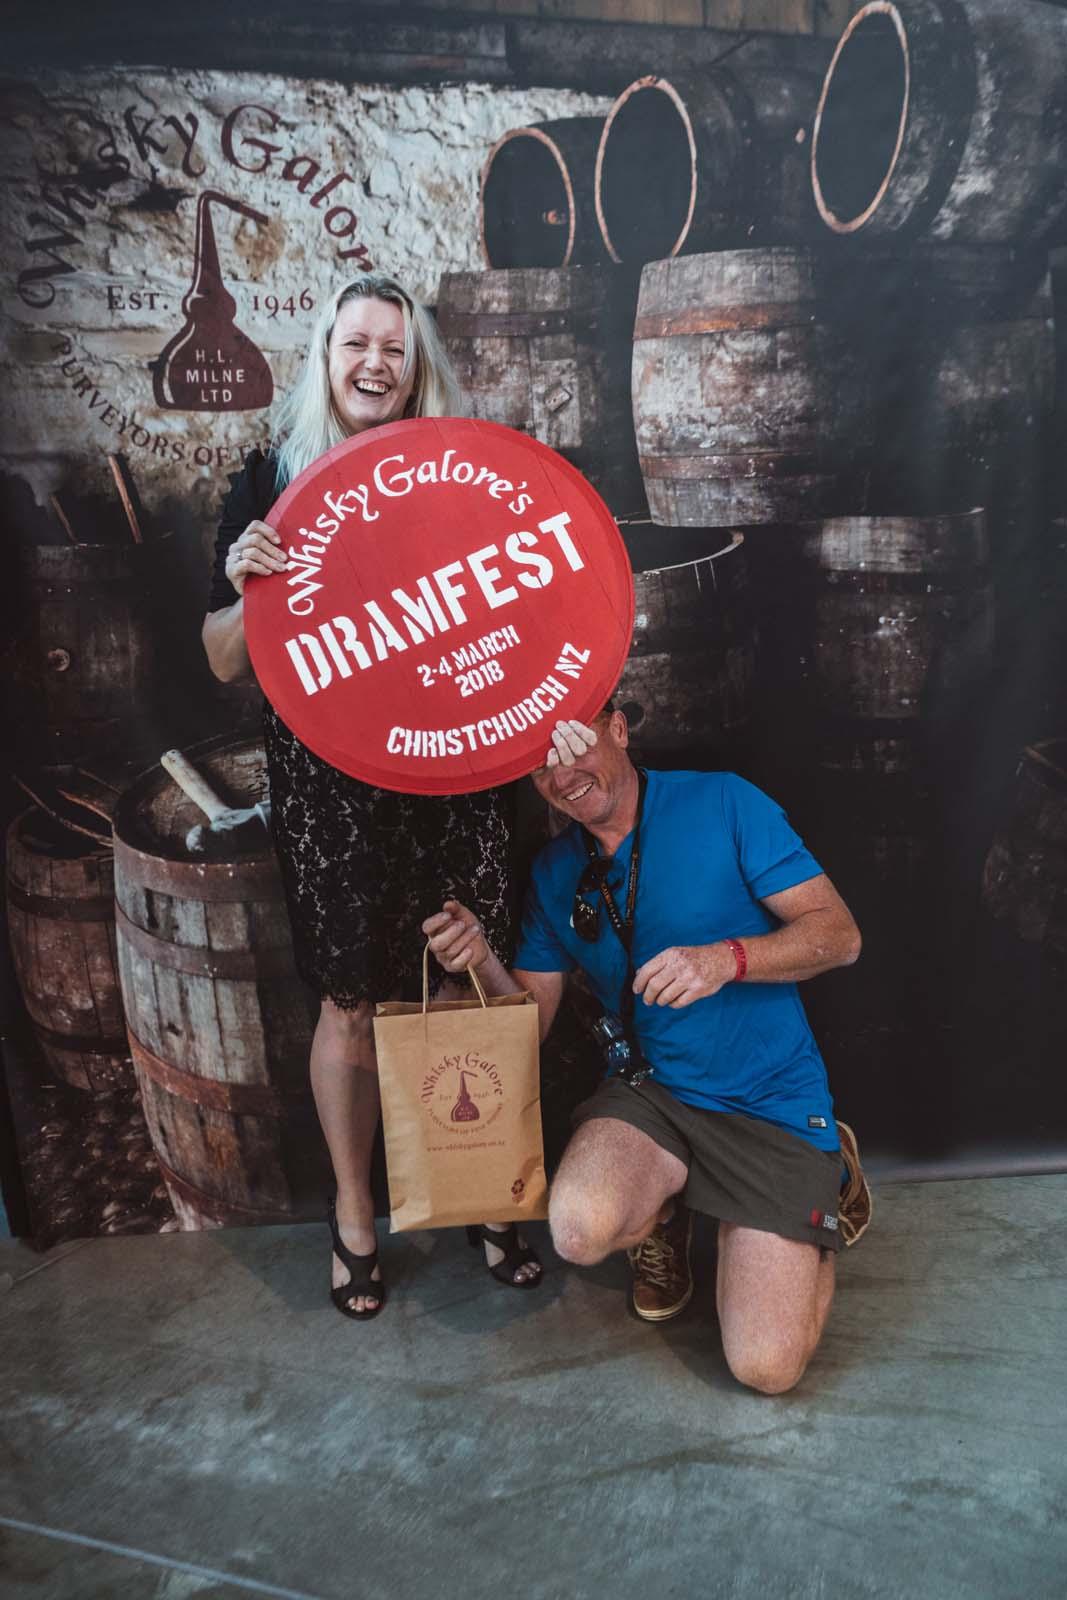 Dramfest 2018 for Whisky Galore-147.jpg